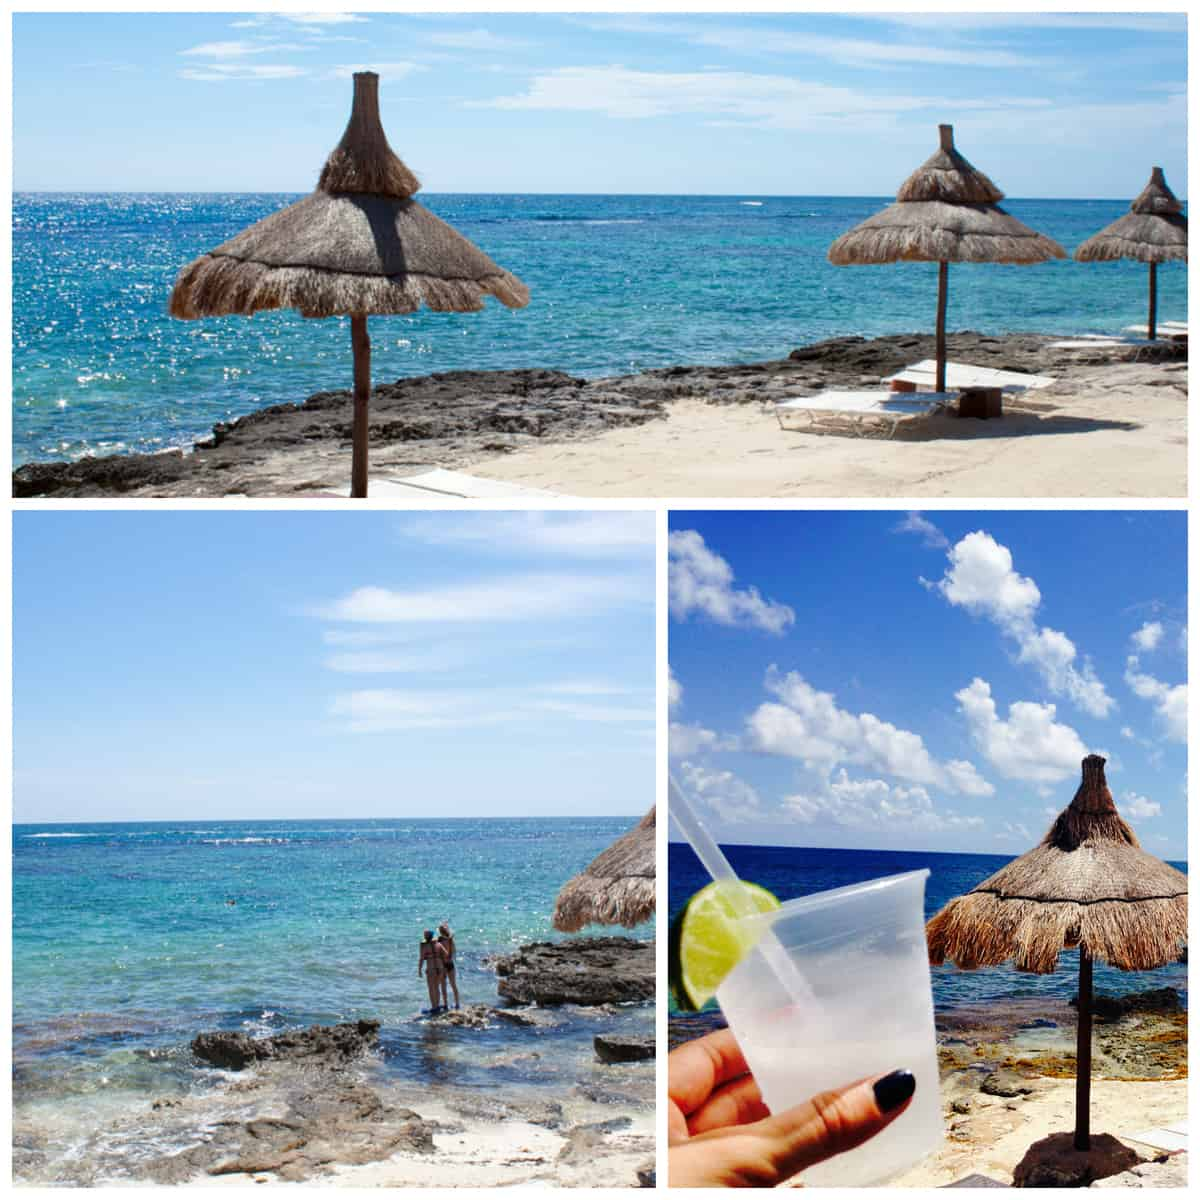 Club Med Cancun Meso-American Reef